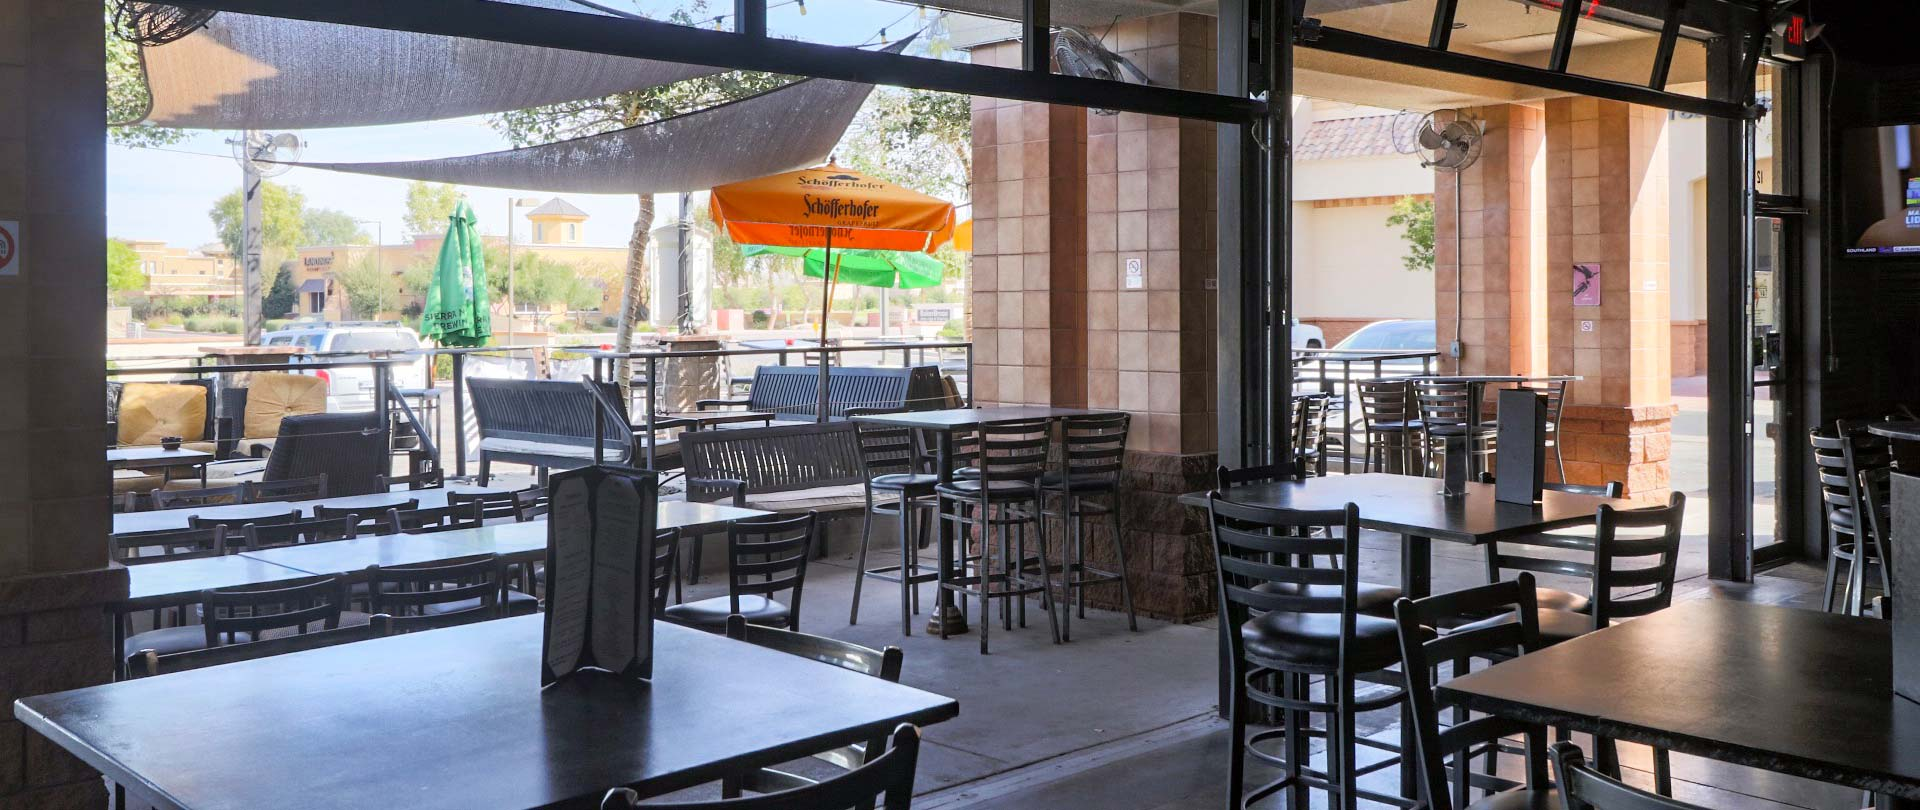 Patio seating at Dirty Blonde Tavern